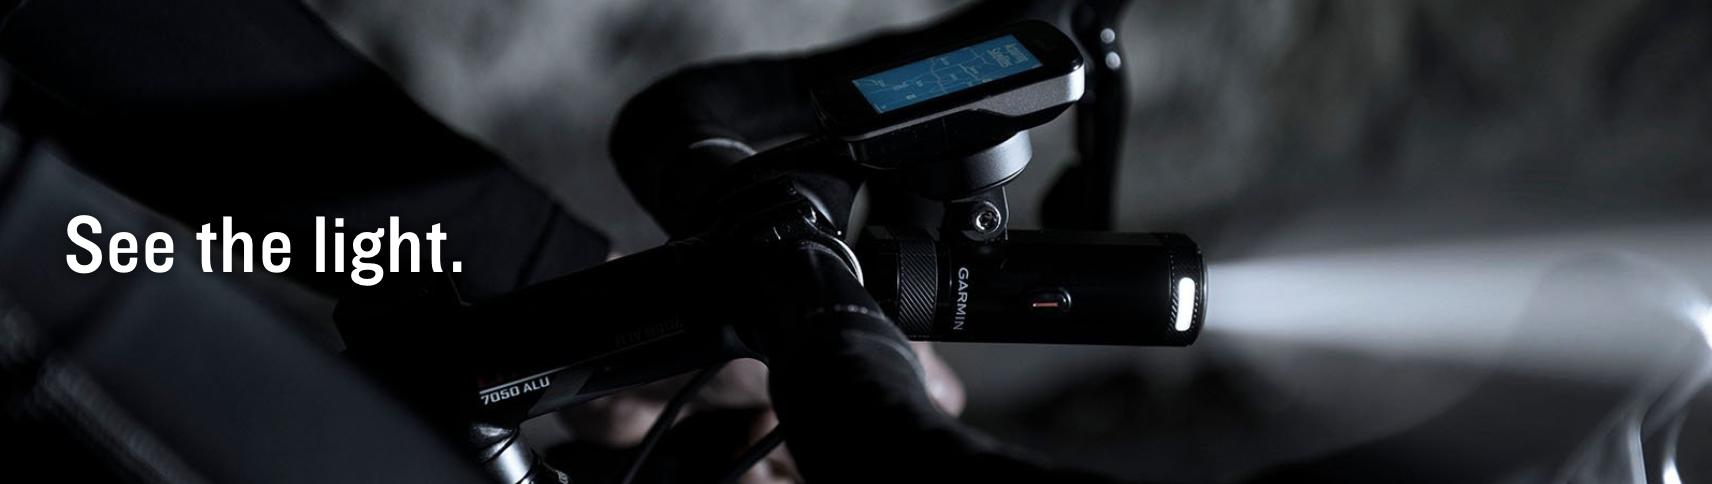 Garmin Varia UT800 Smart Headlight - Urban Edition (Bike Mount)